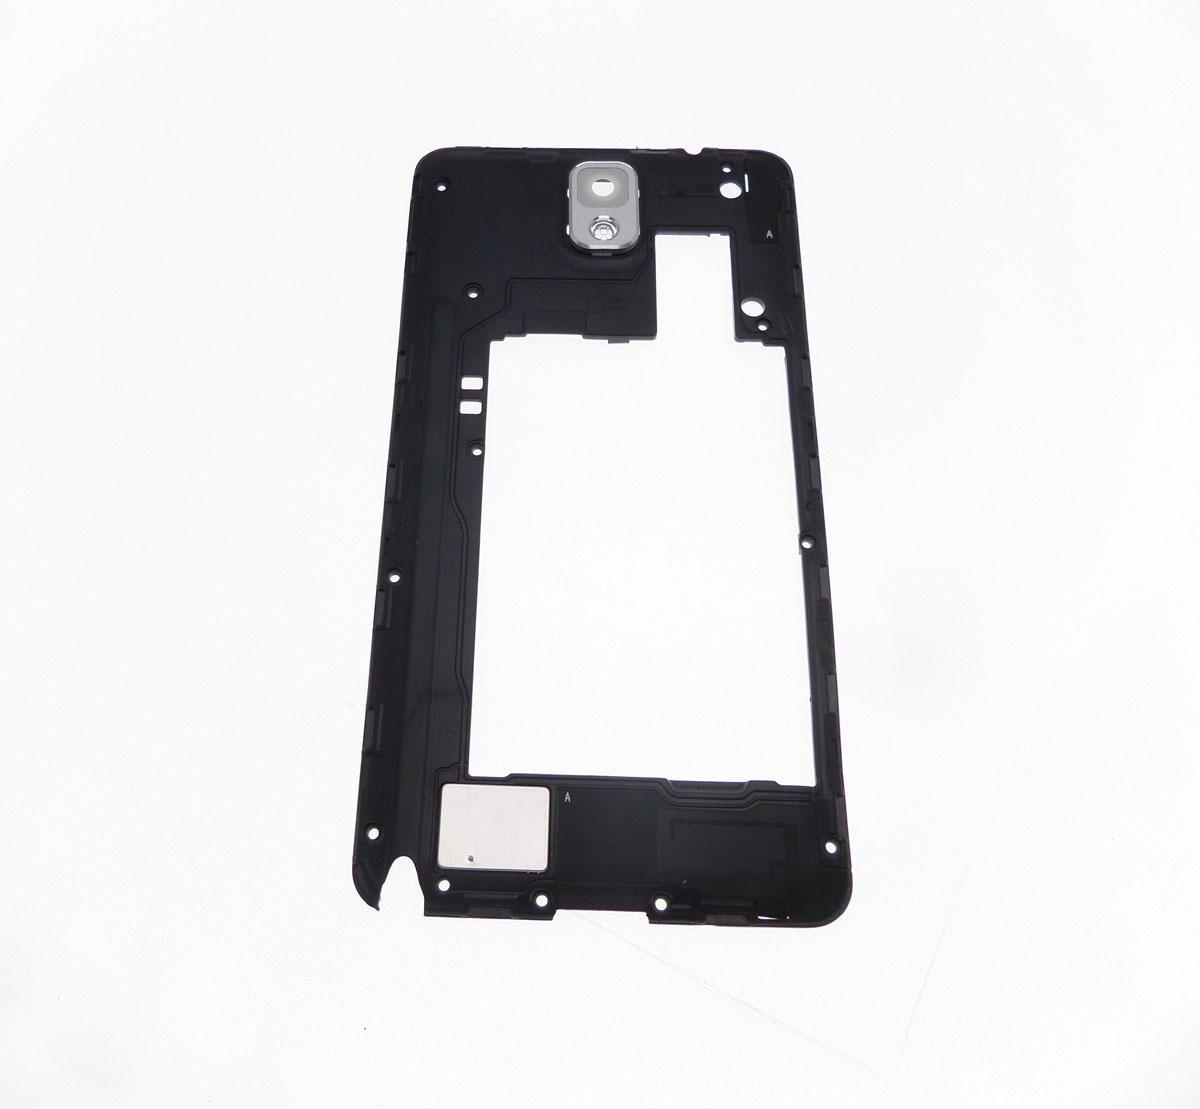 Châssis arrière pour Samsung Galaxy Note 3 N9000 N9005